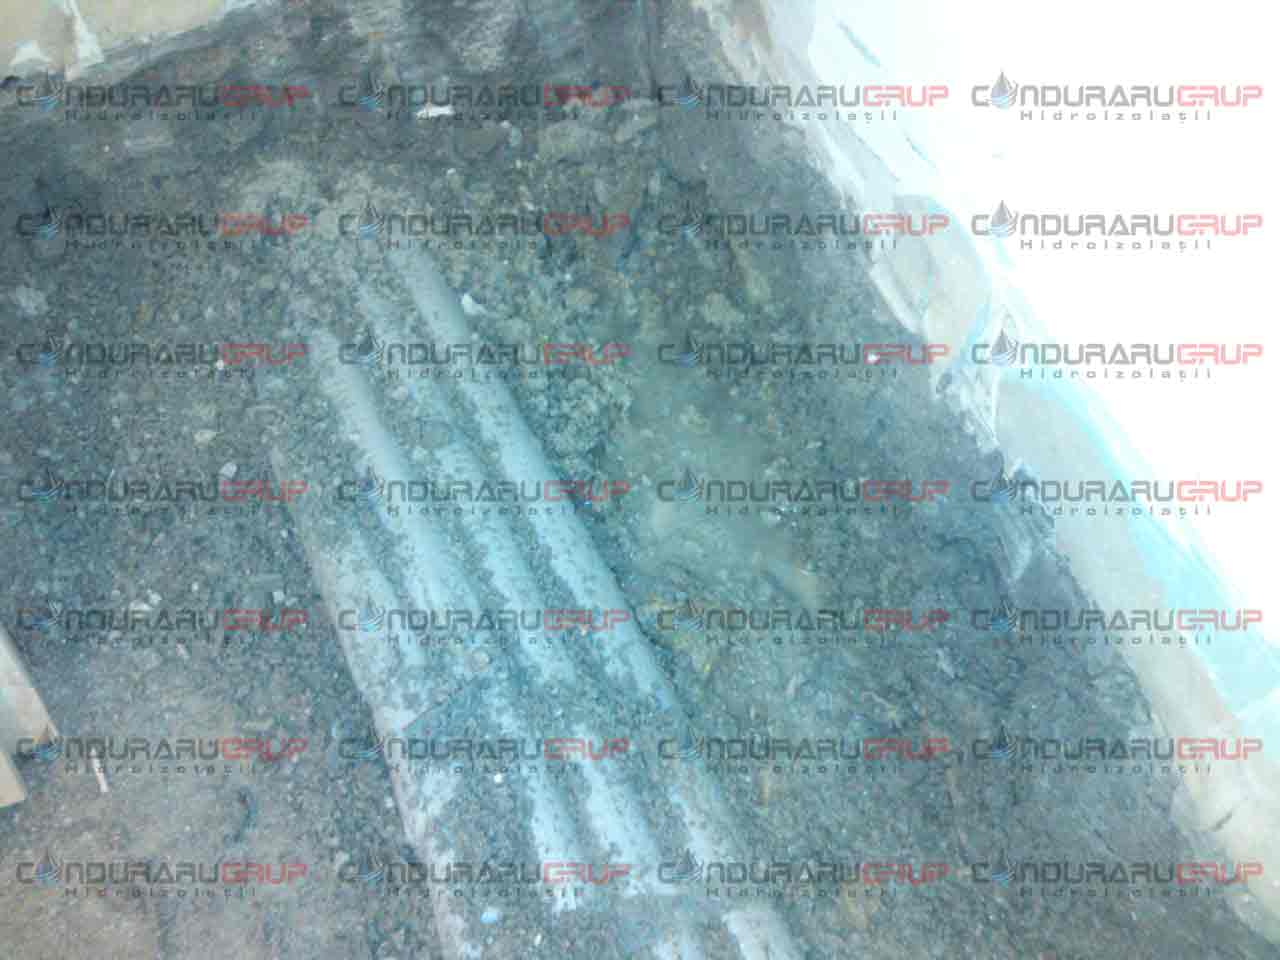 Imobil proprietate personala CONDURARU GRUP - Poza 13